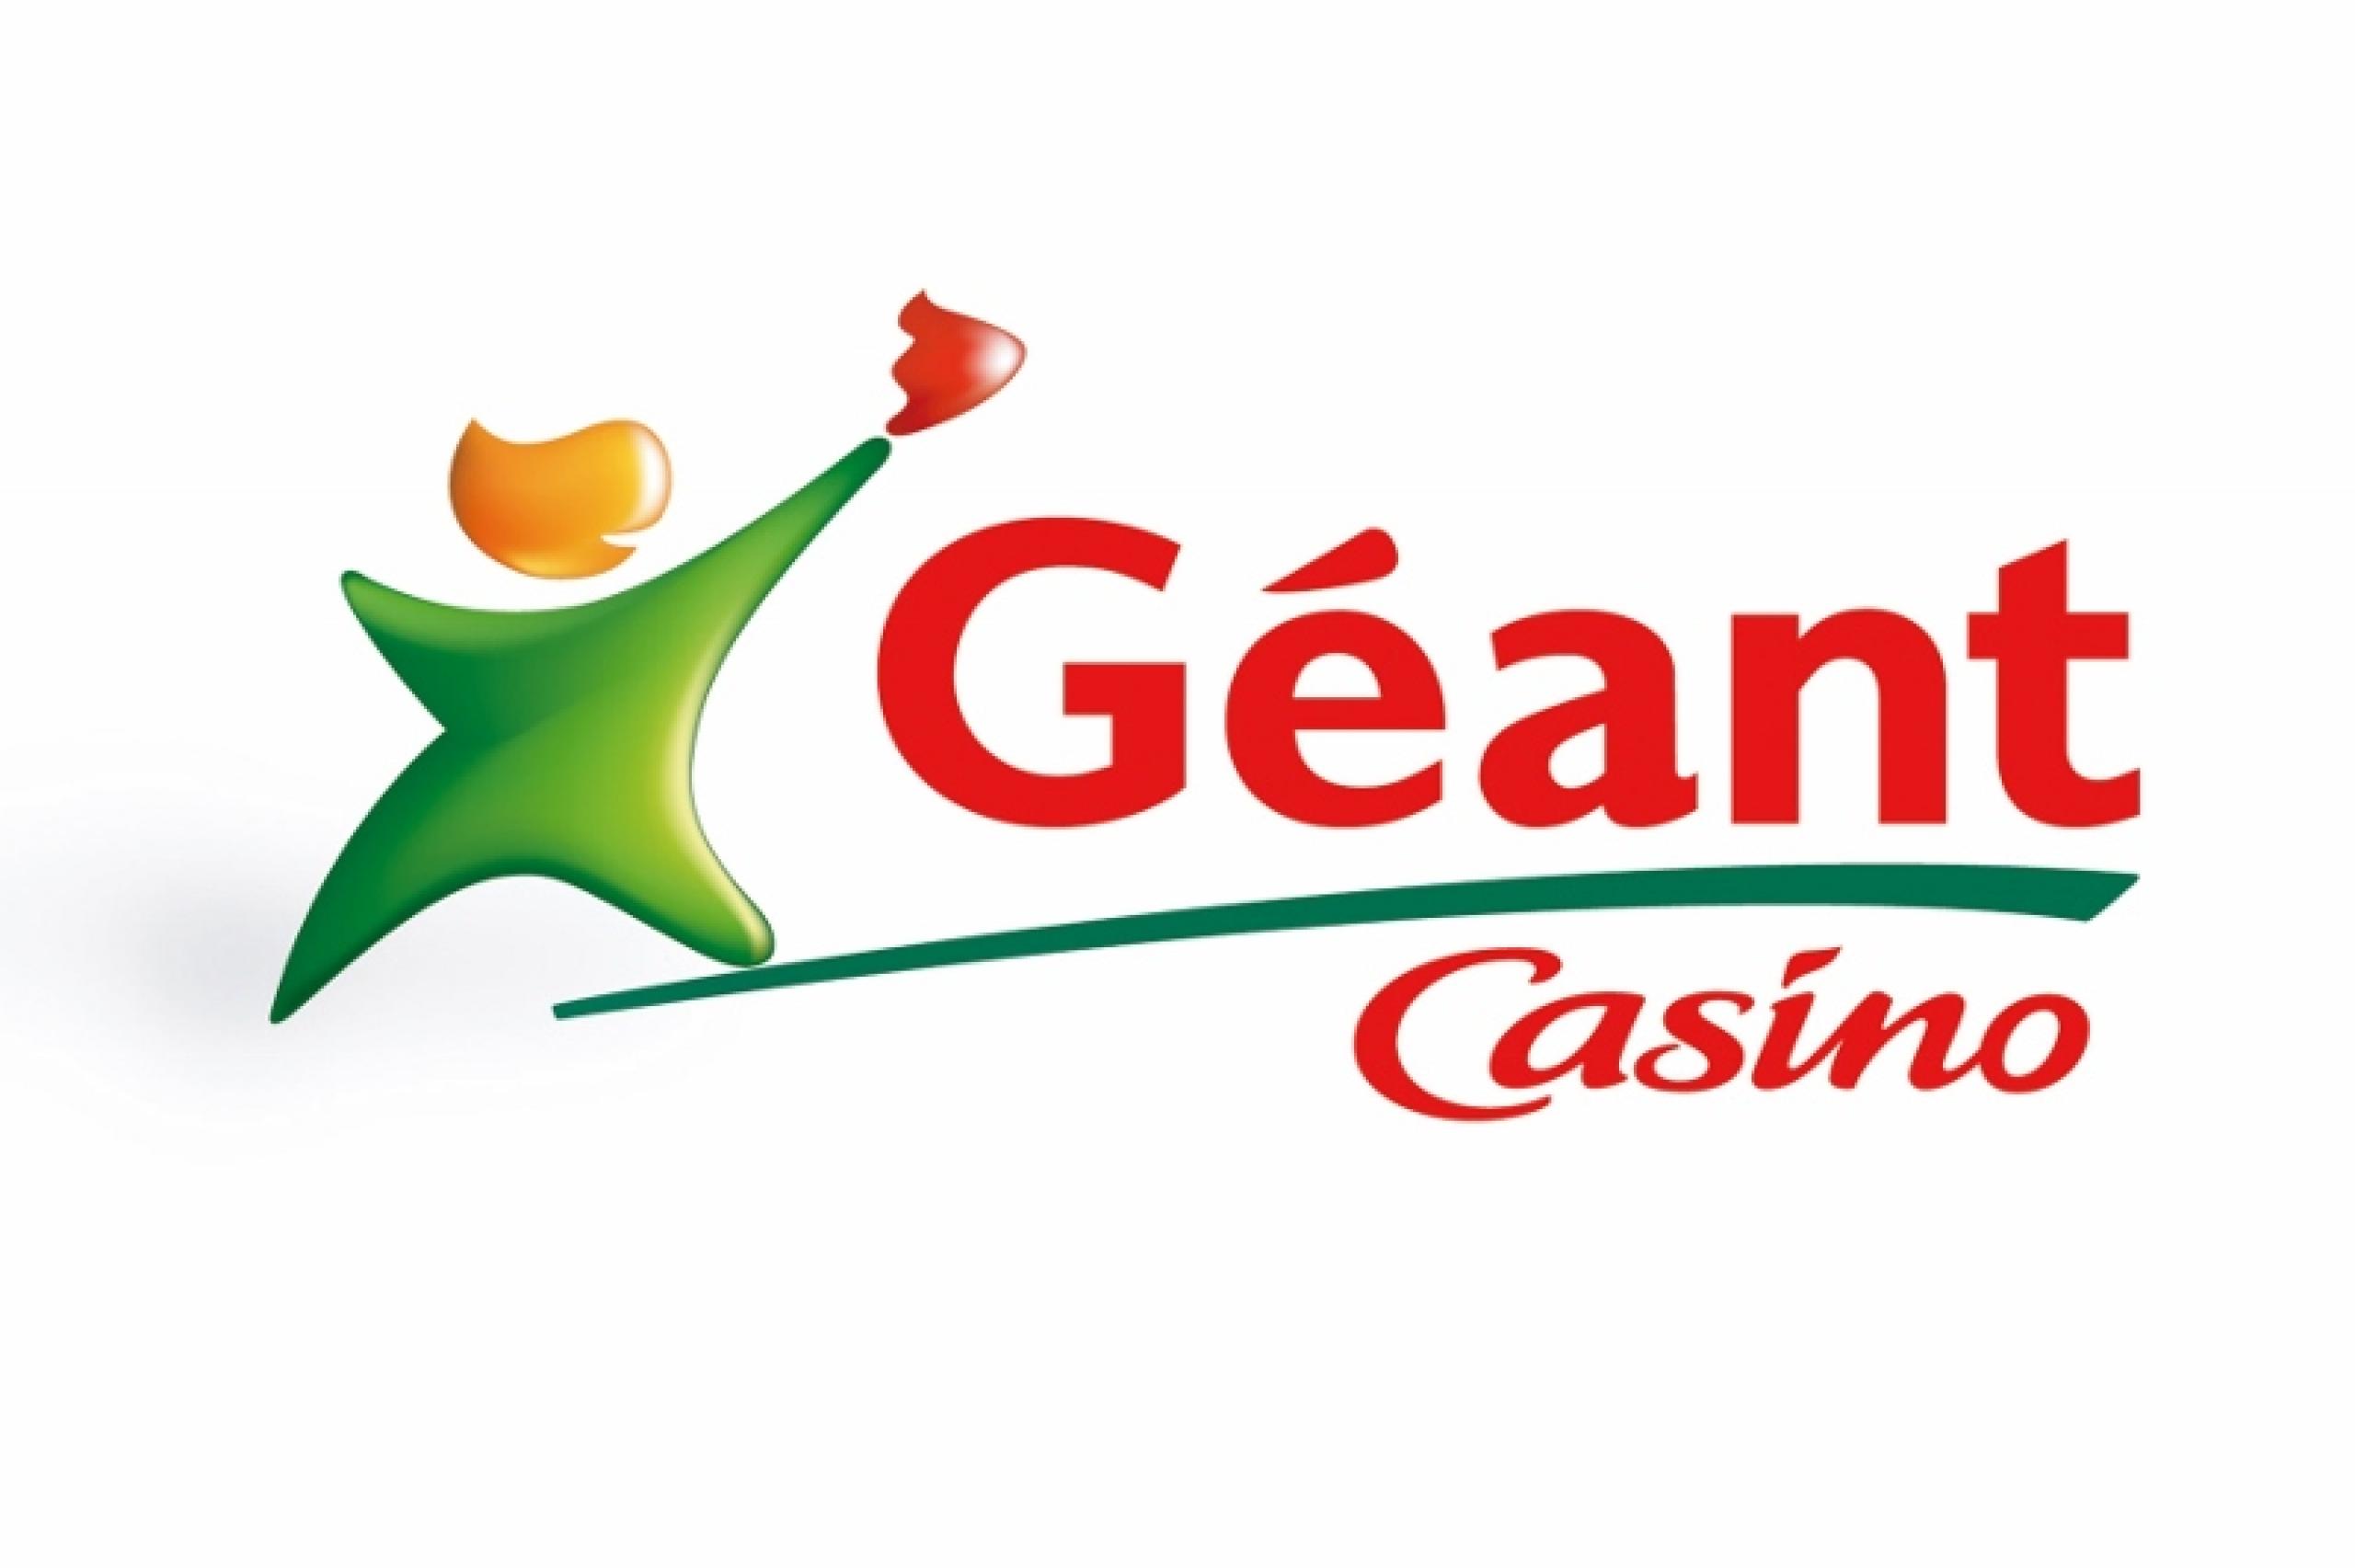 Geant casino casino home niagara page